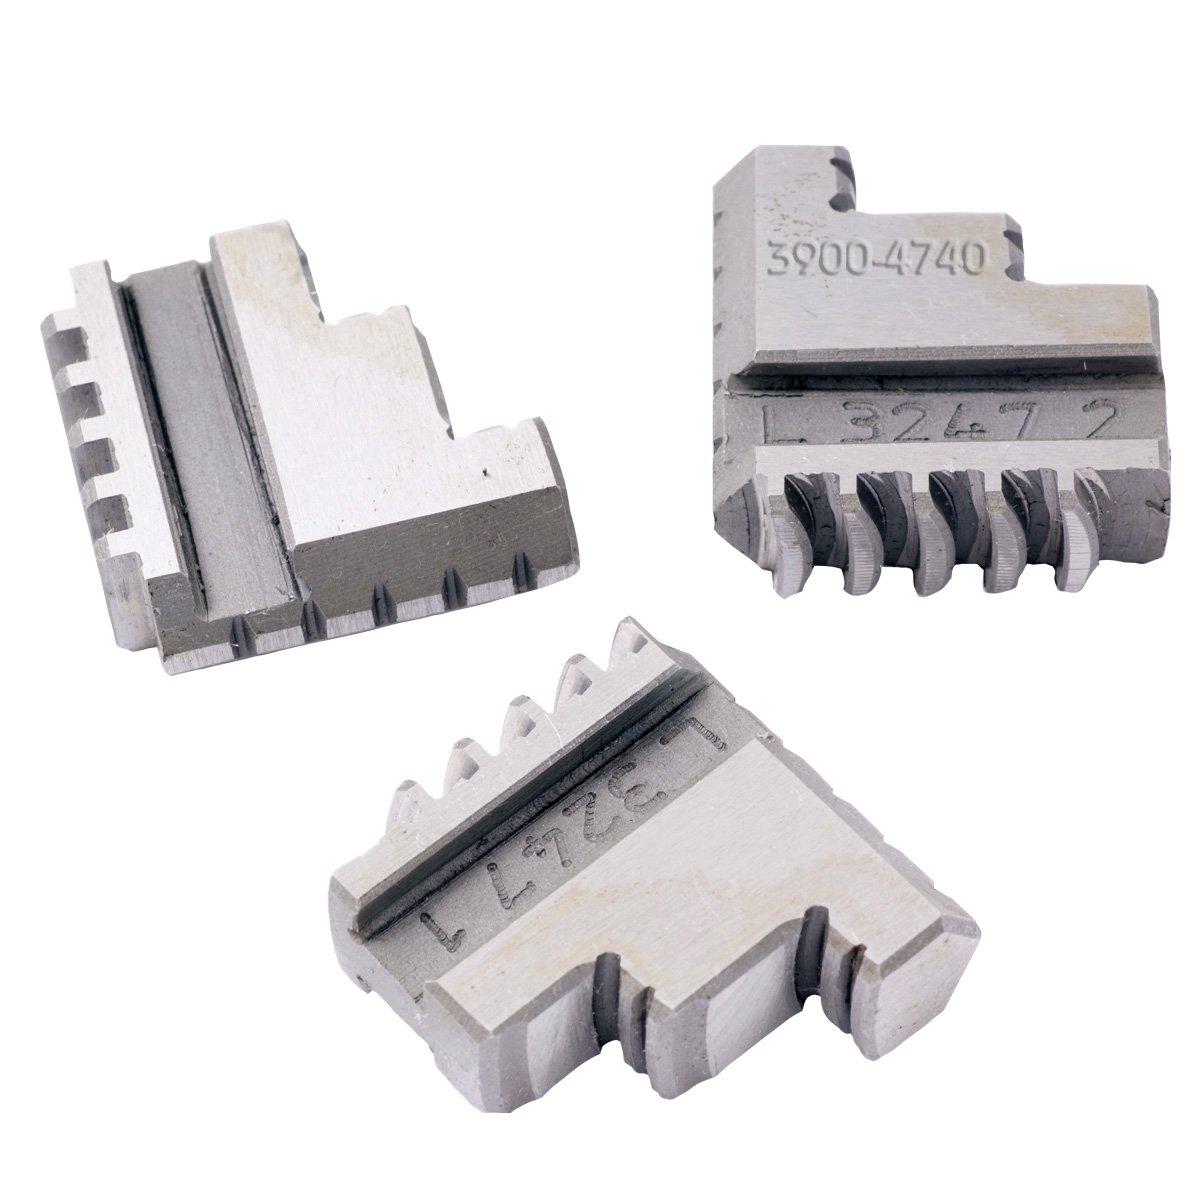 HHIP 3900-4740 3 Piece Steel Internal Hard Jaw Set for 3'' 3-Jaw K11 80 Lathe Chuck